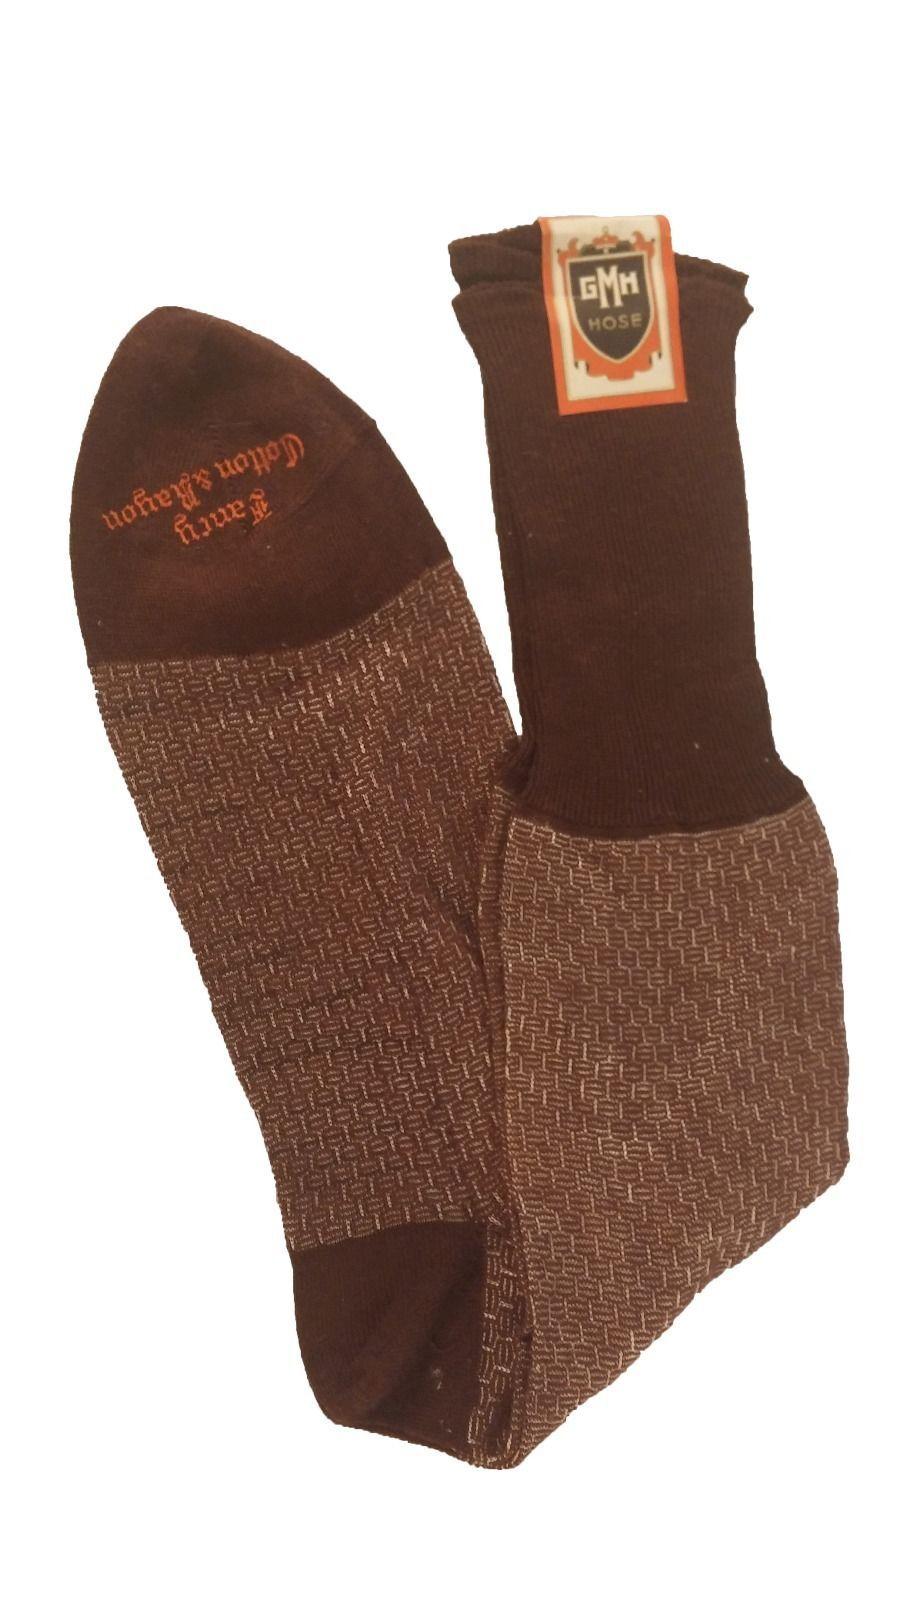 Vintage Mens Dress Socks Shimmery Brown White Detail GMH Hose Fancy Cotton Rayon | eBay